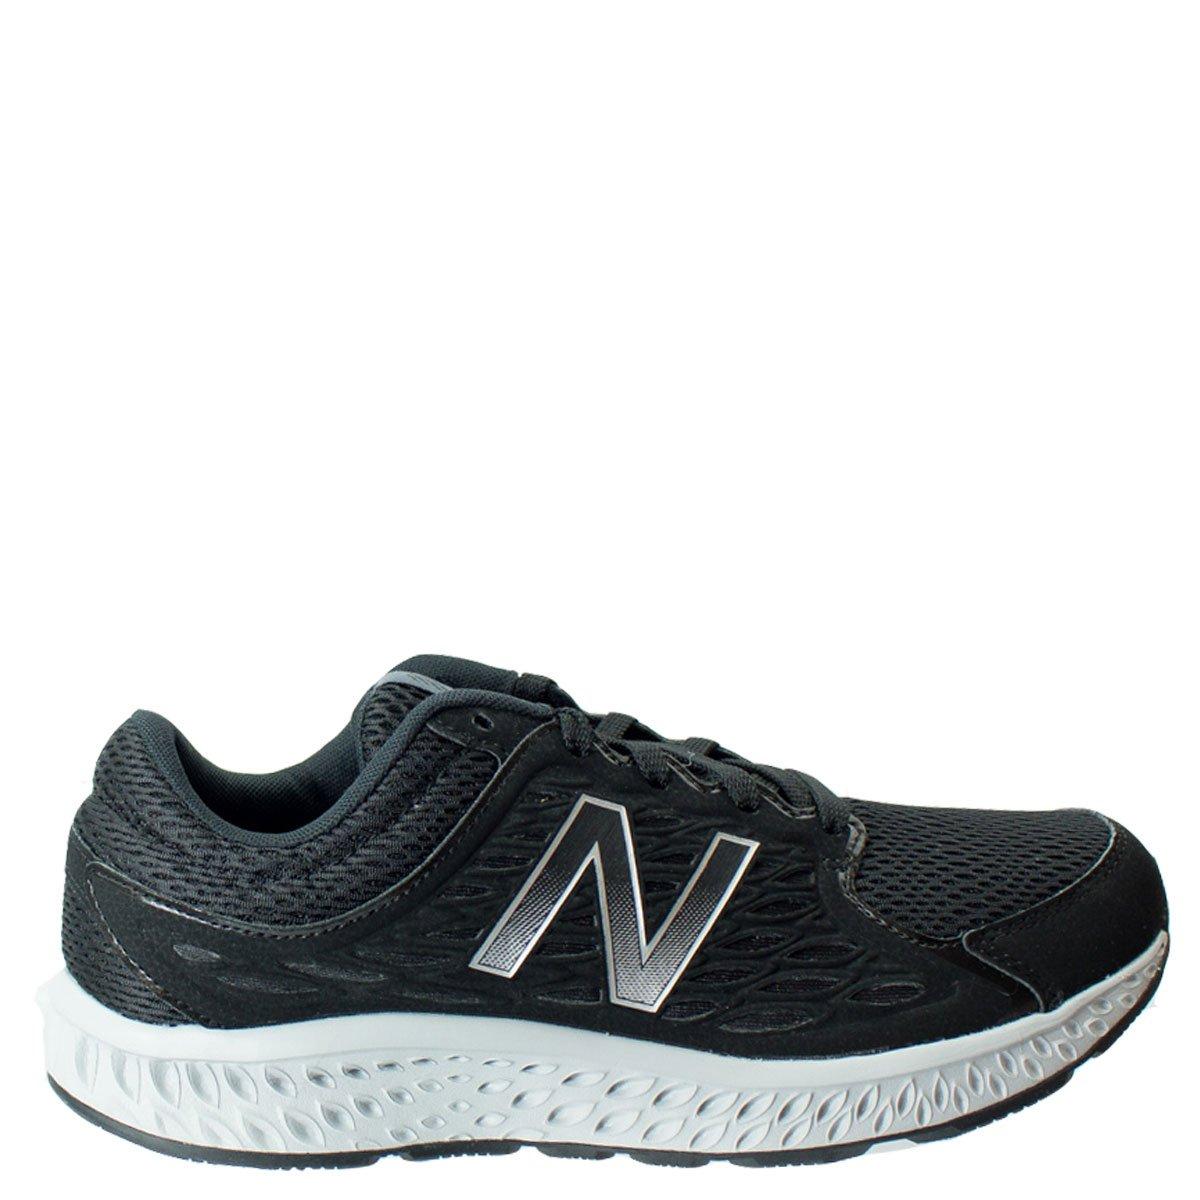 29b0b55863b Bizz Store - Tênis Masculino New Balance Running 420